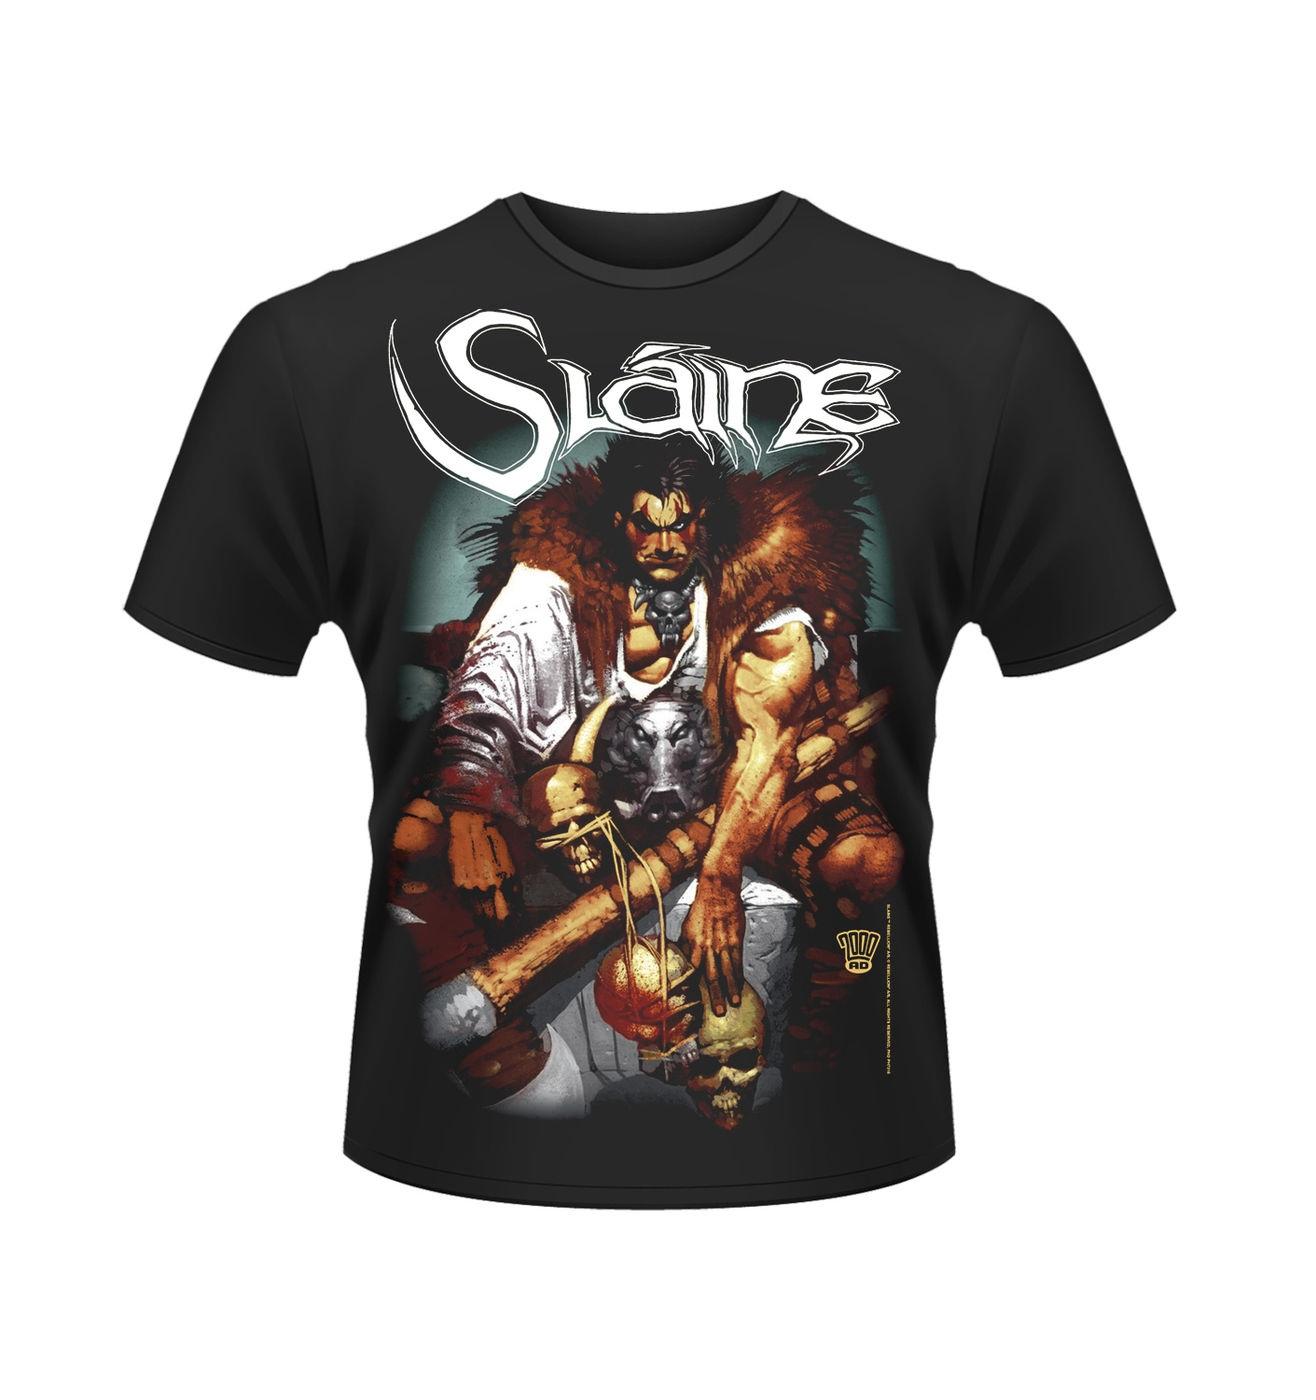 OFFICIAL 2000AD Slaine t-shirt